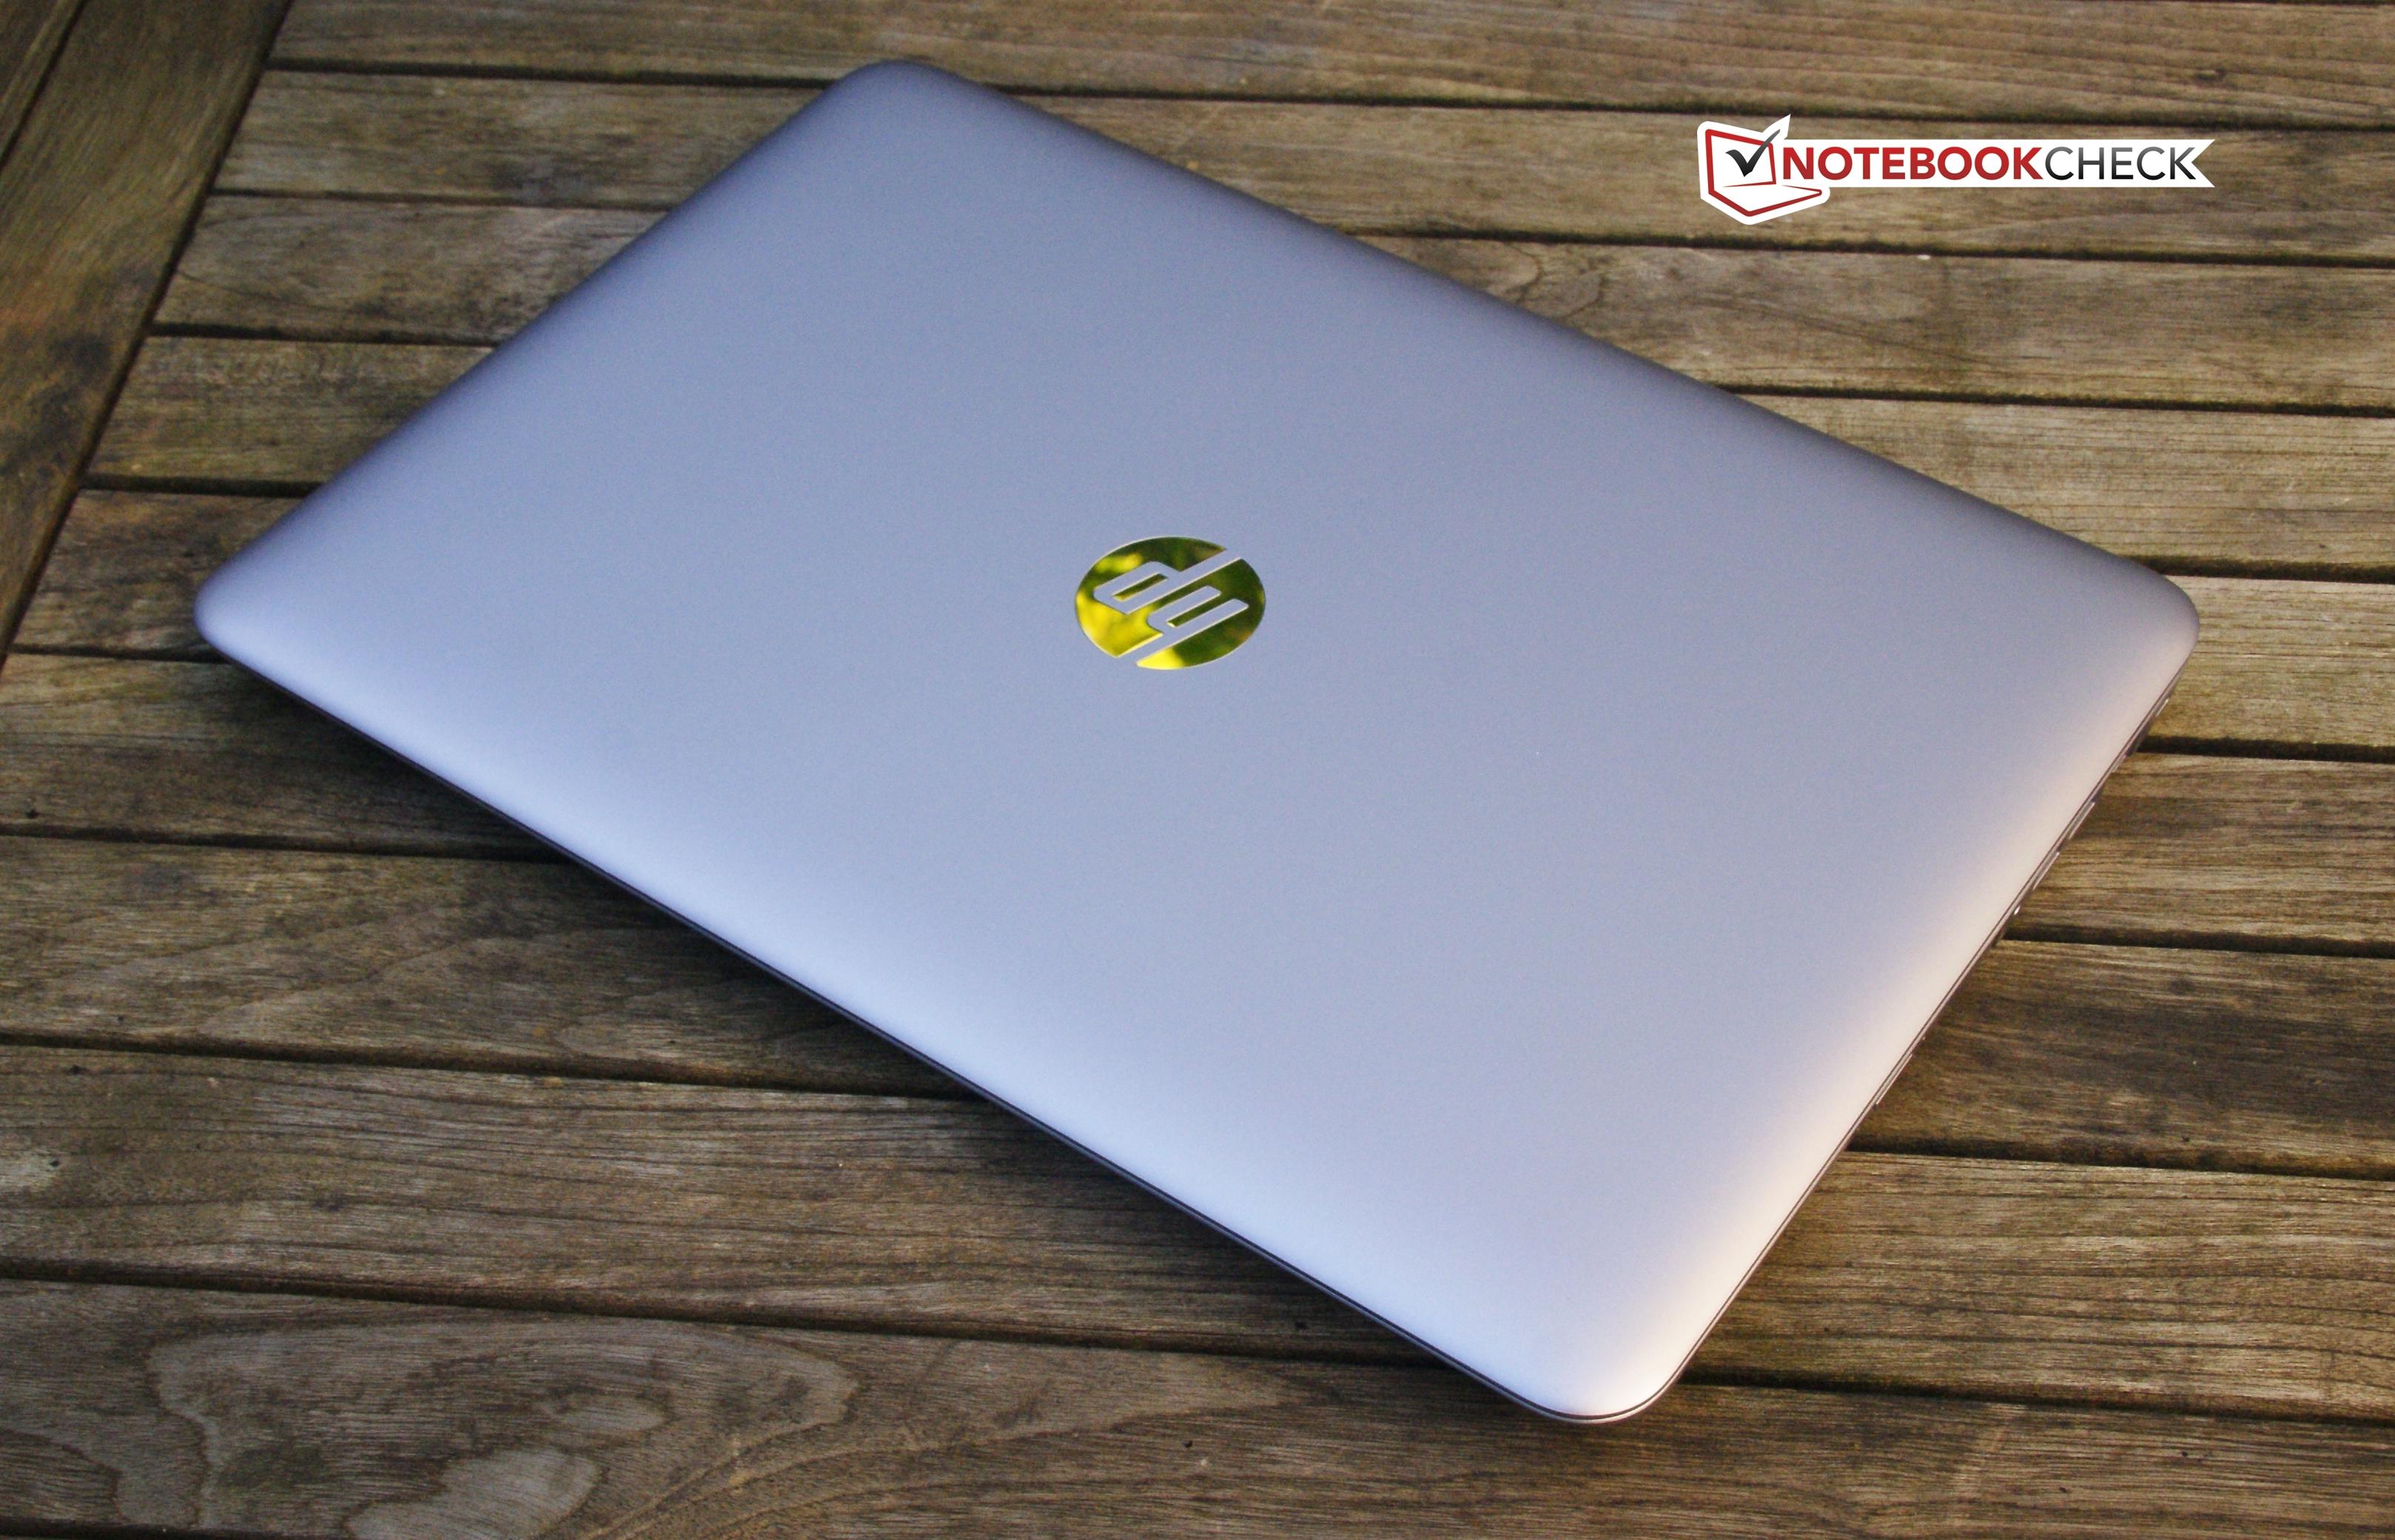 Hp Probook 450 G4 Y8b60ea Notebook Review Reviews Computer Hard Drive Circuit Board Zazzle Resolution